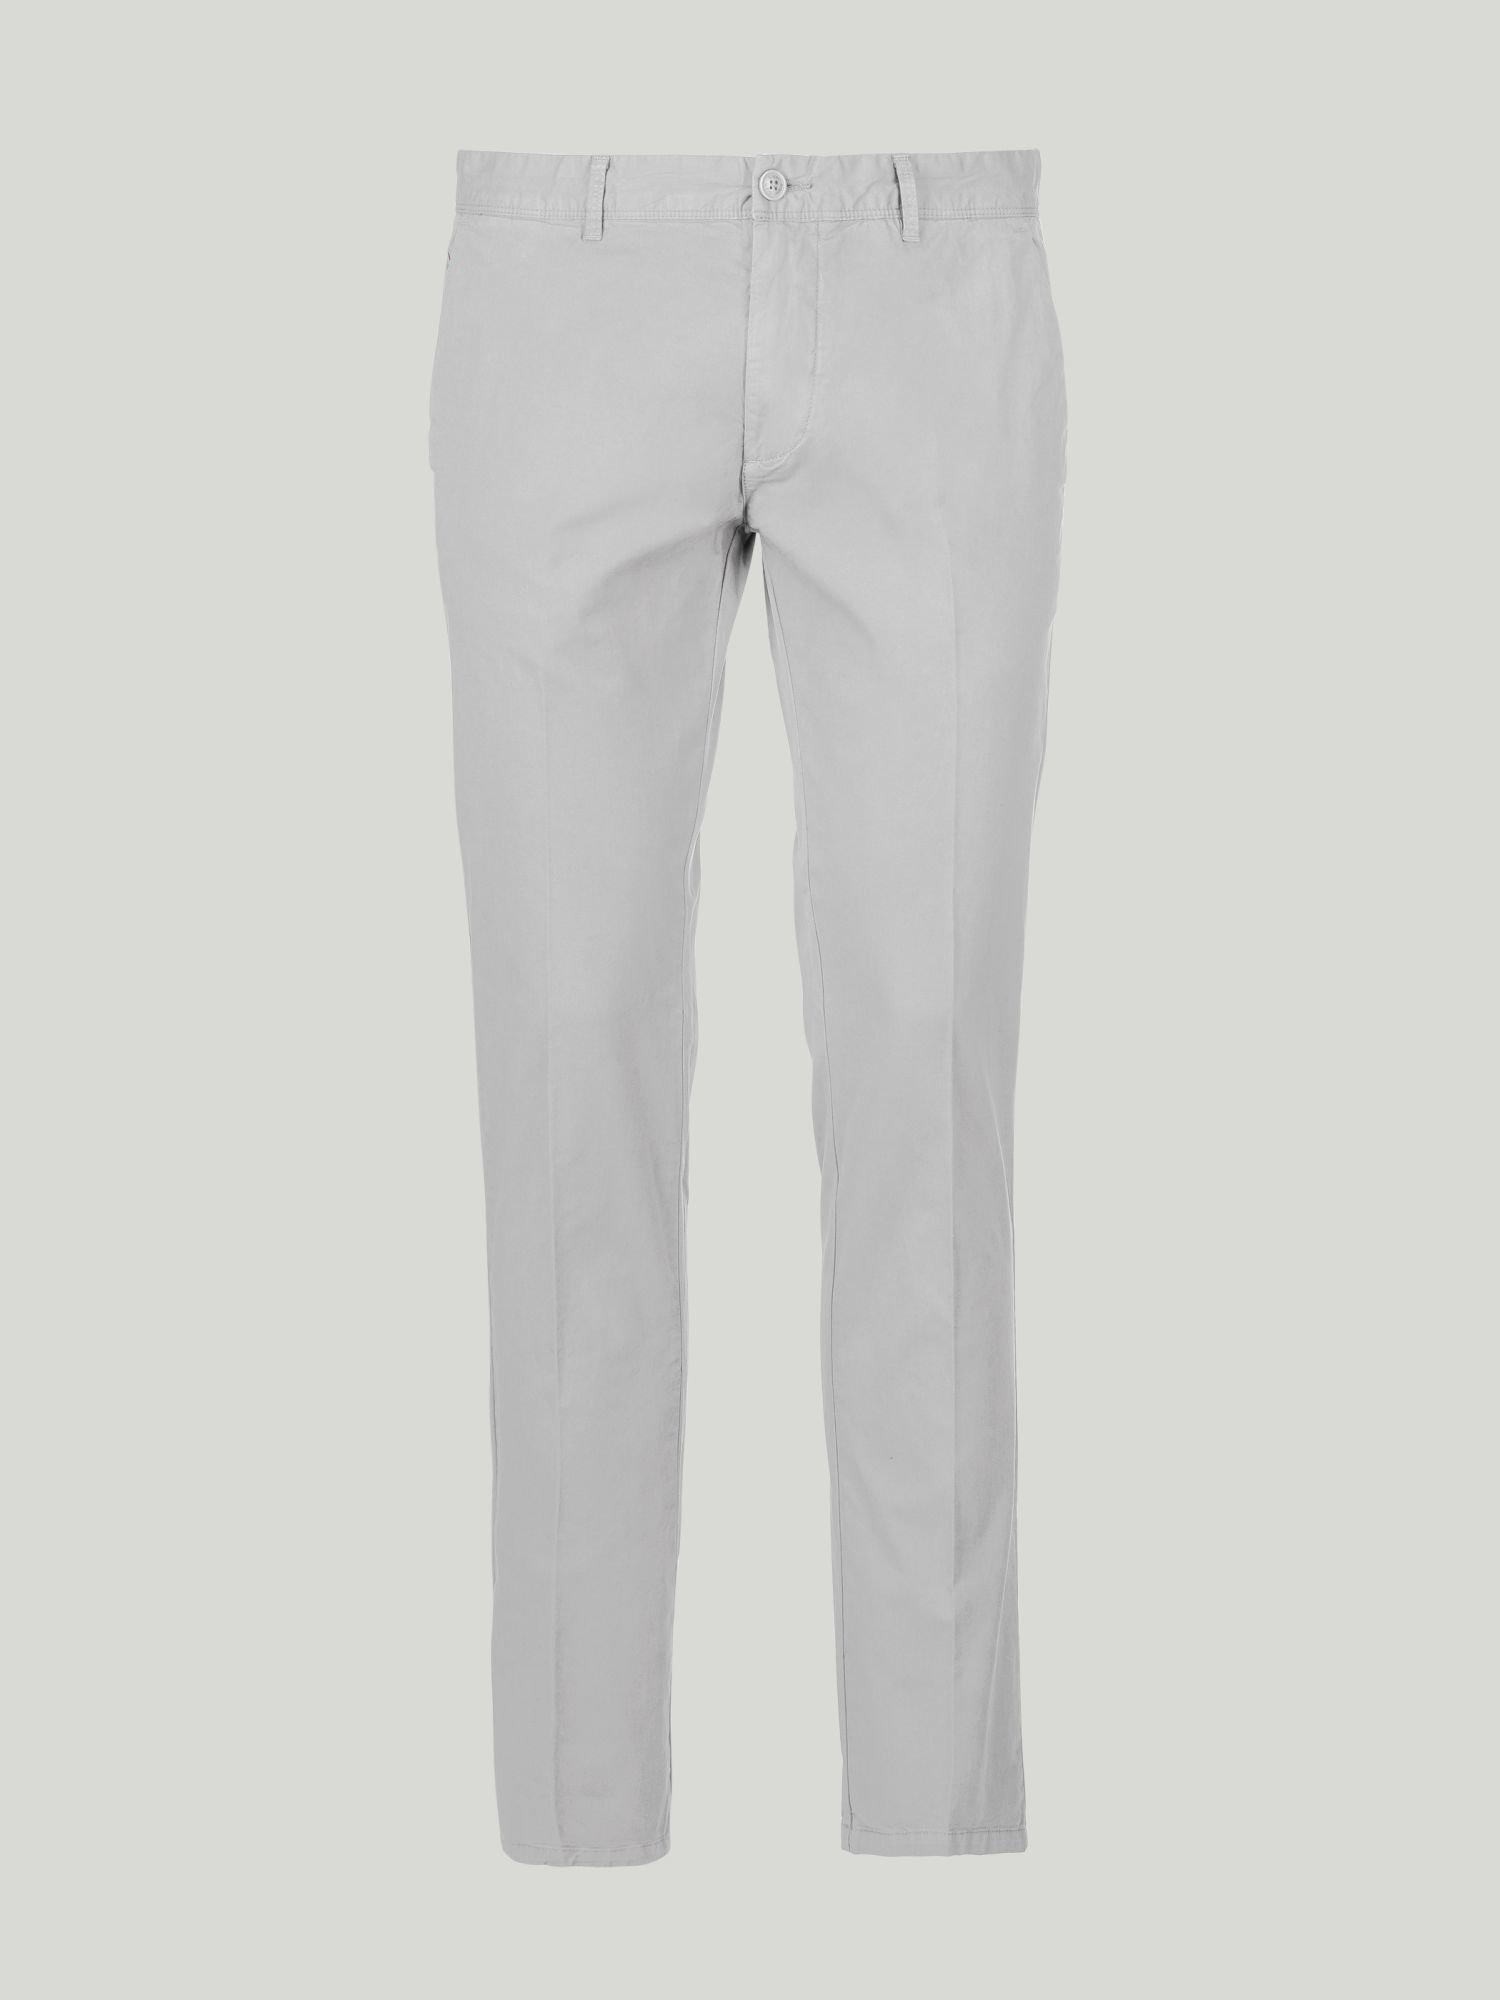 Berth Trousers - Fog Grey